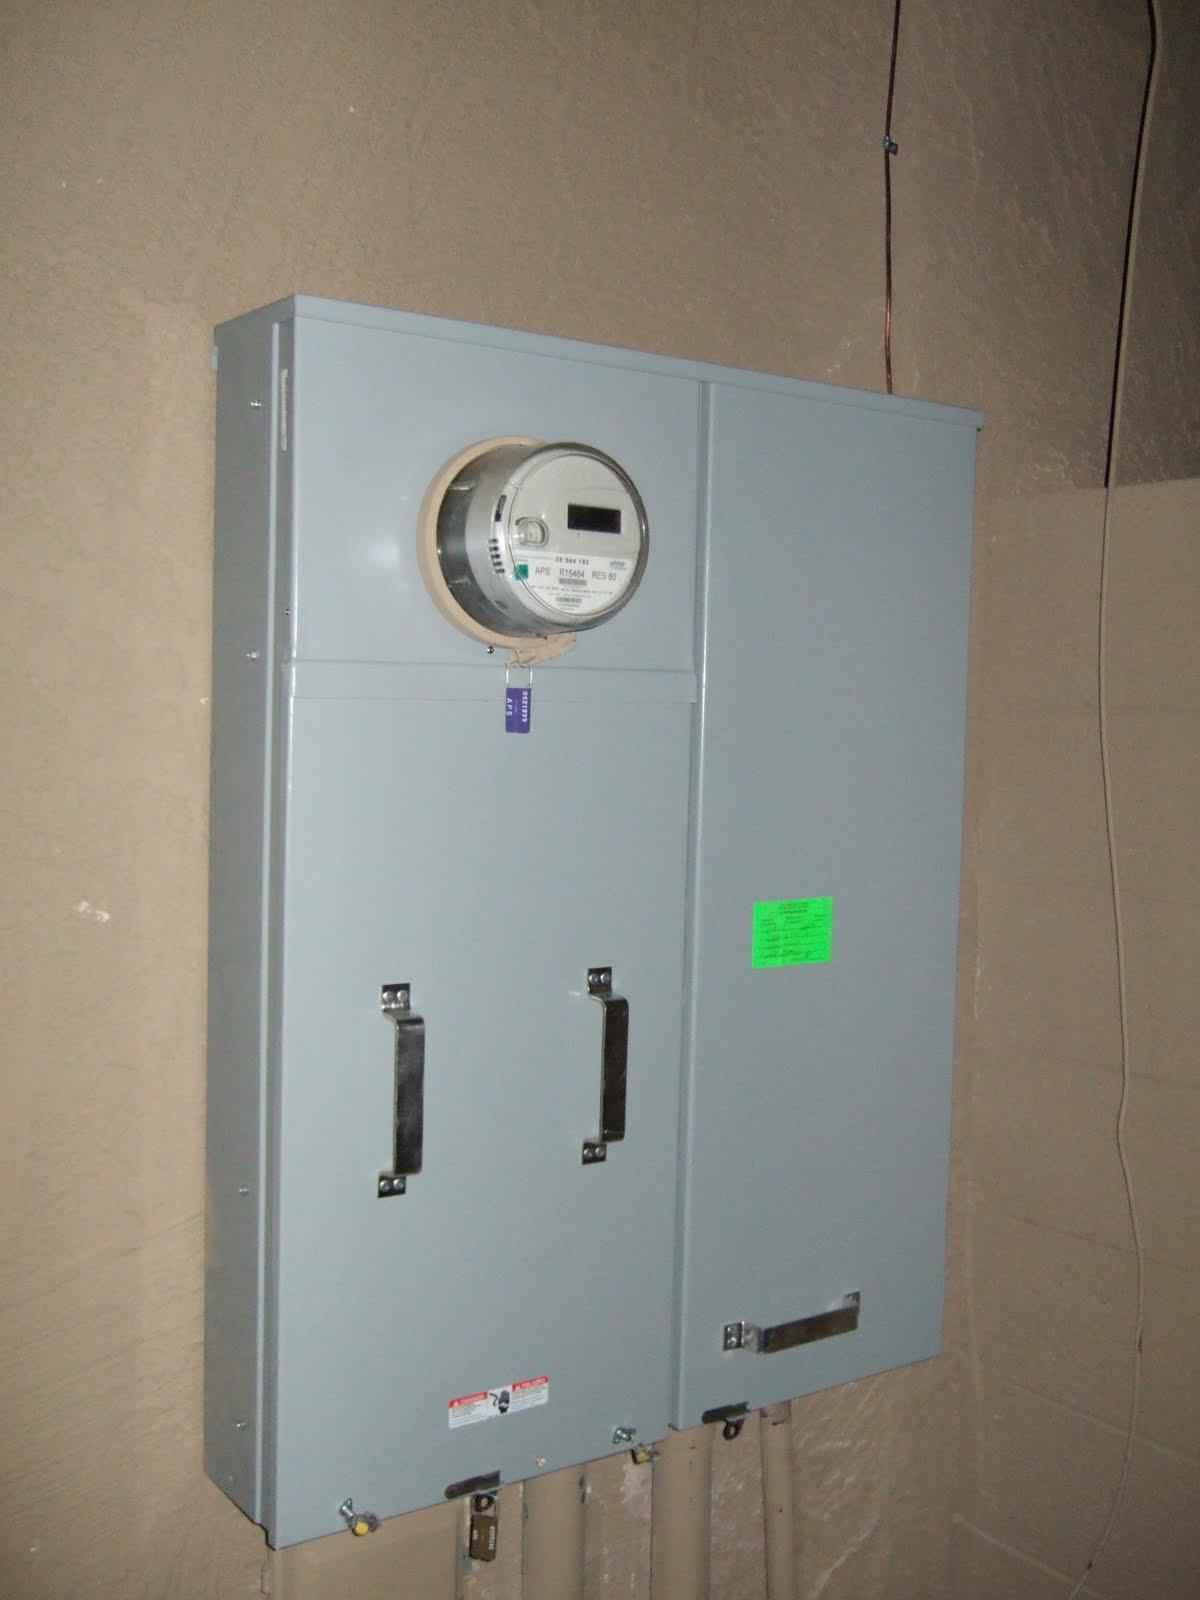 Panel Amperage Meters : Azben amp meter panel installed